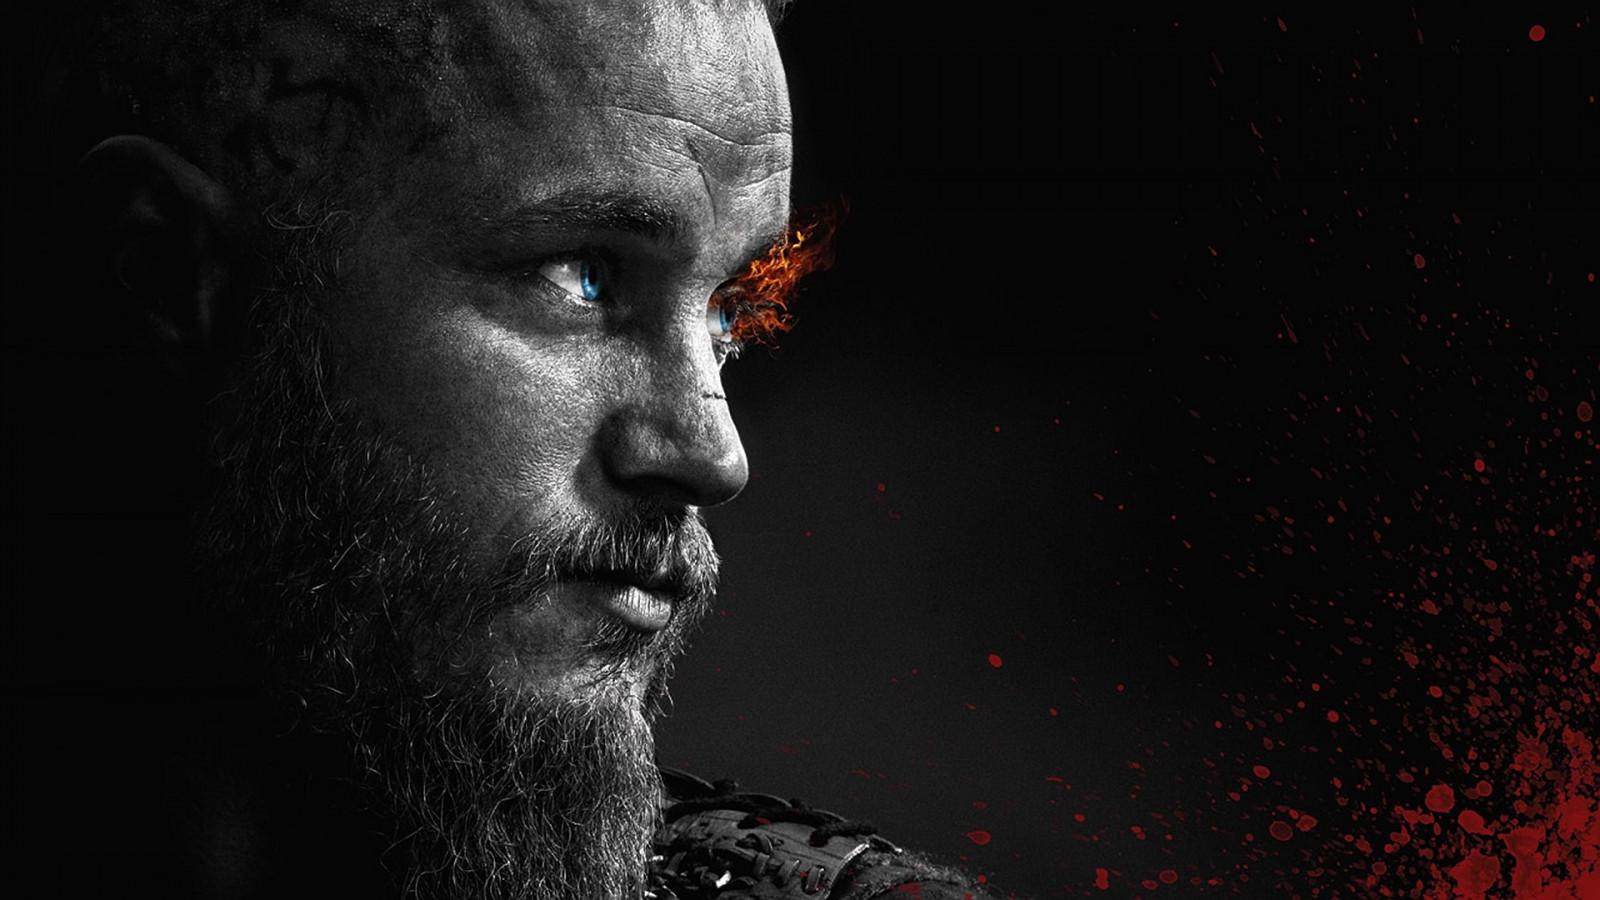 Wallpaper : Ragnar Lodbrok, Vikings, TV, fire, monochrome ...